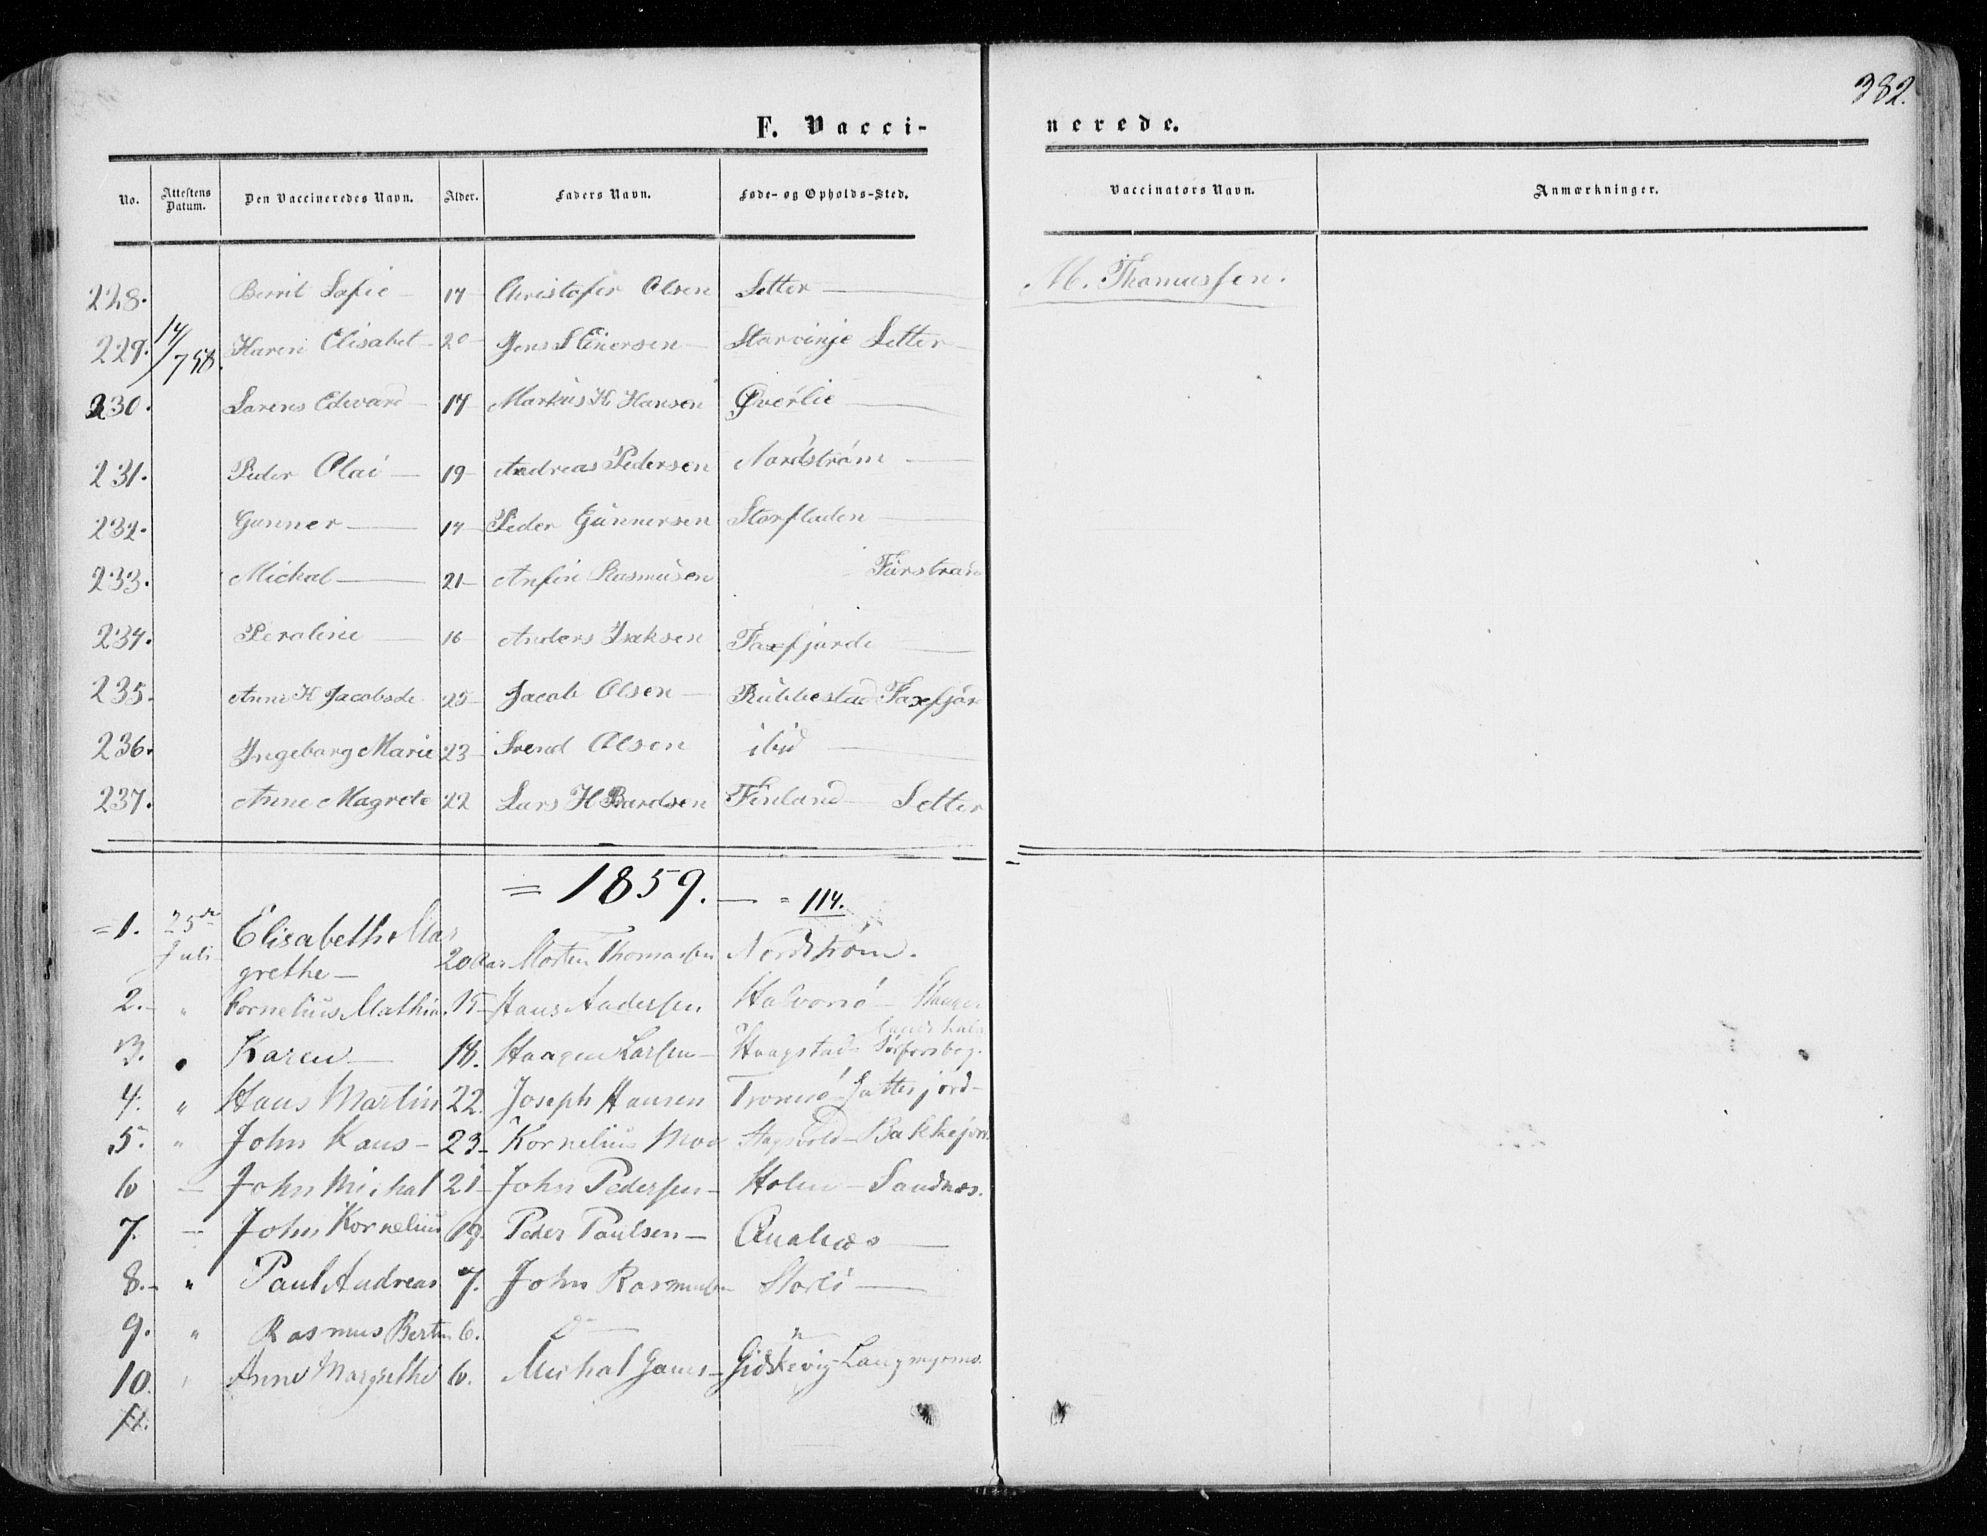 SATØ, Tranøy sokneprestkontor, I/Ia/Iaa/L0007kirke: Ministerialbok nr. 7, 1856-1866, s. 382